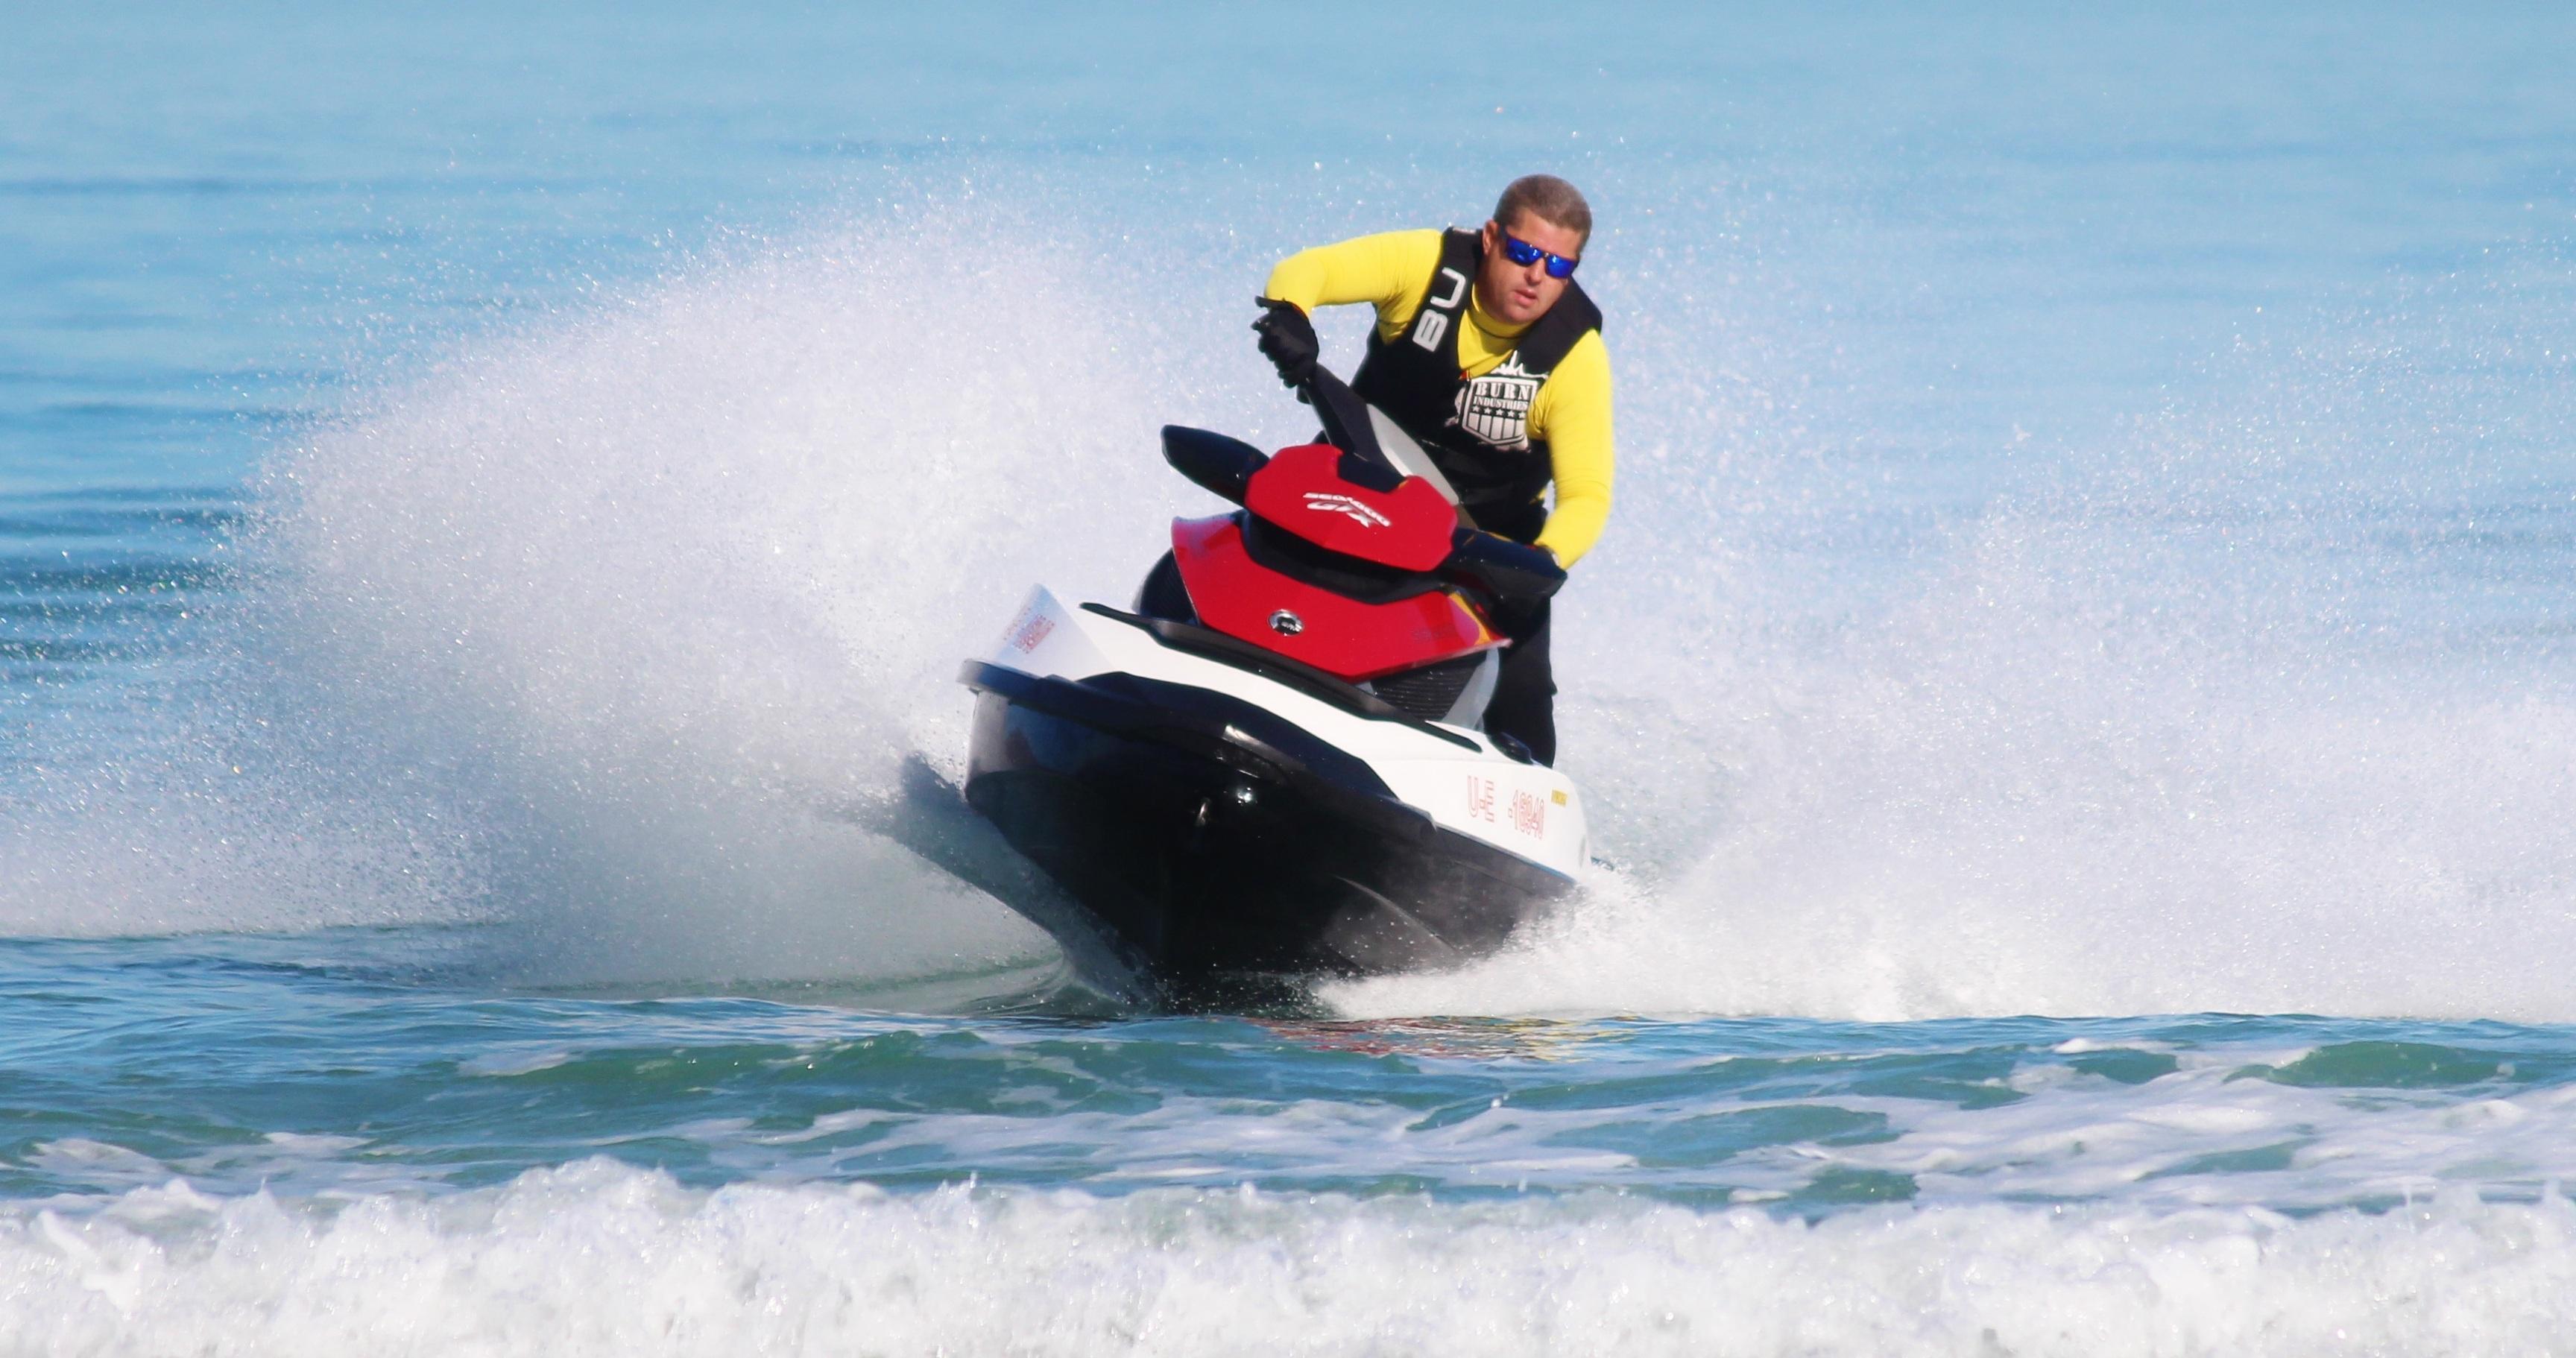 Jet Ski Rider image - Free stock photo - Public Domain ...